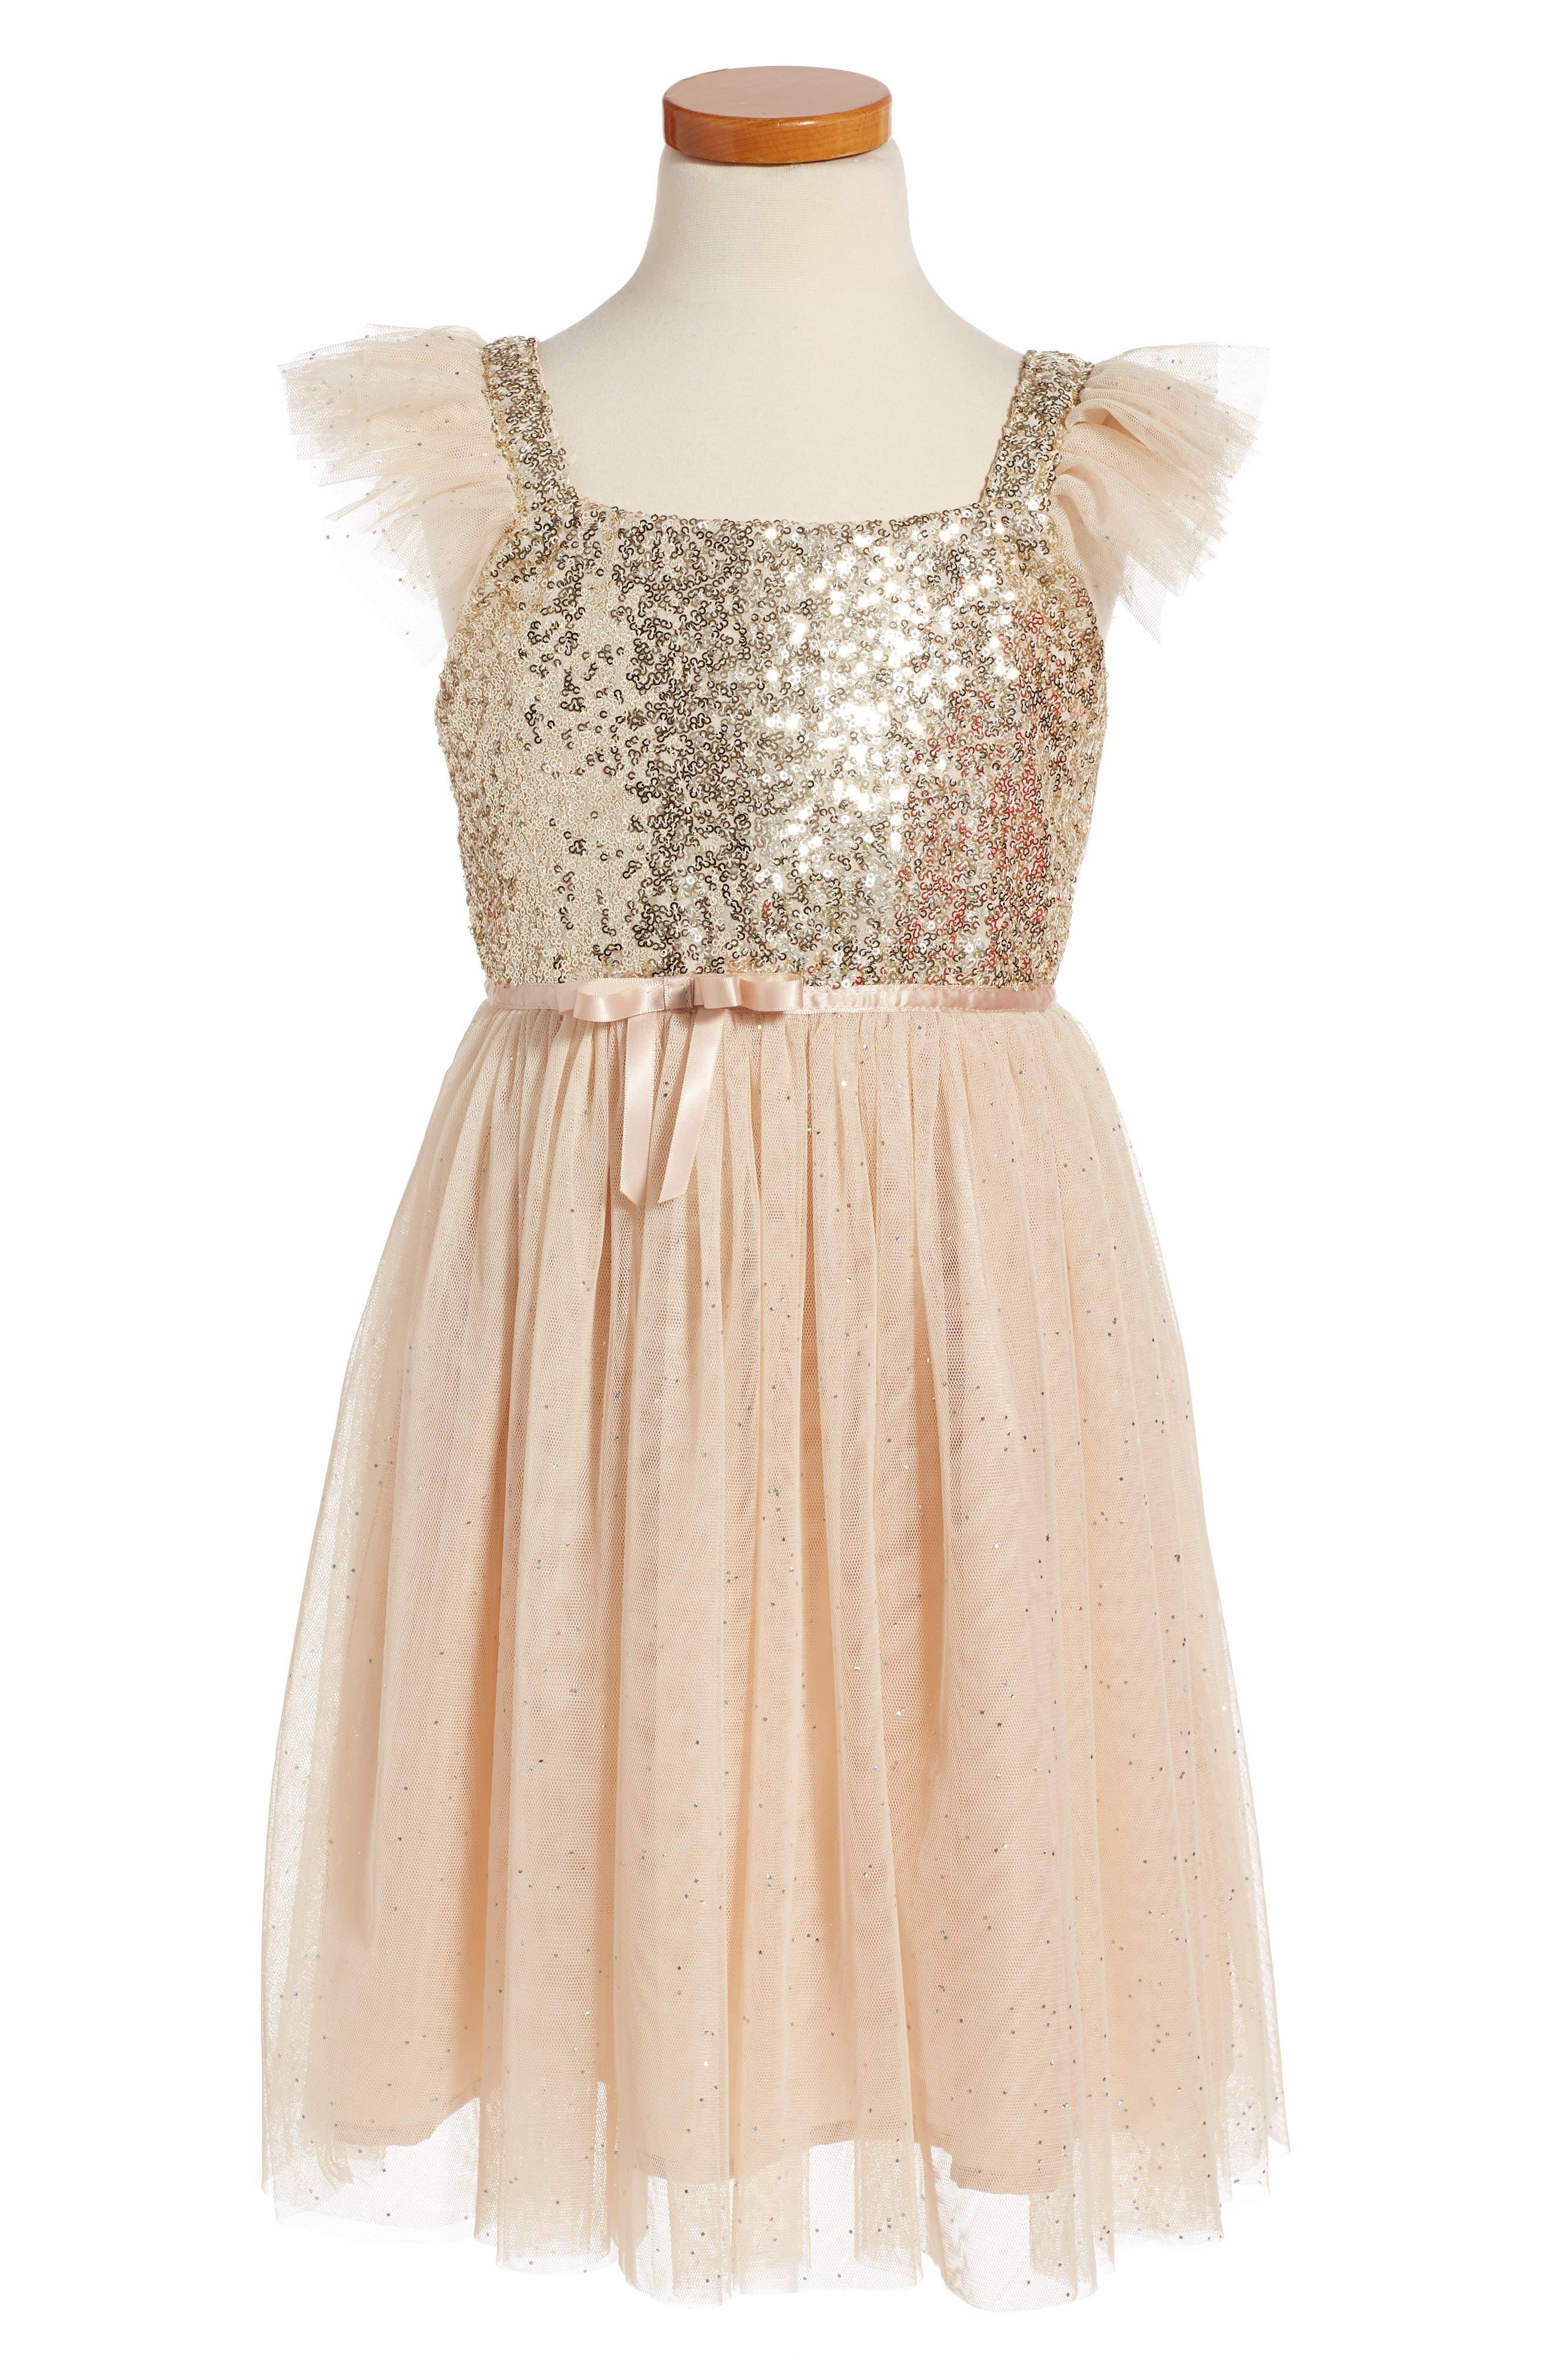 Main Image - PopatuSequin Bodice Tulle Dress (Toddler Girls, Little Girls & Big Girls)